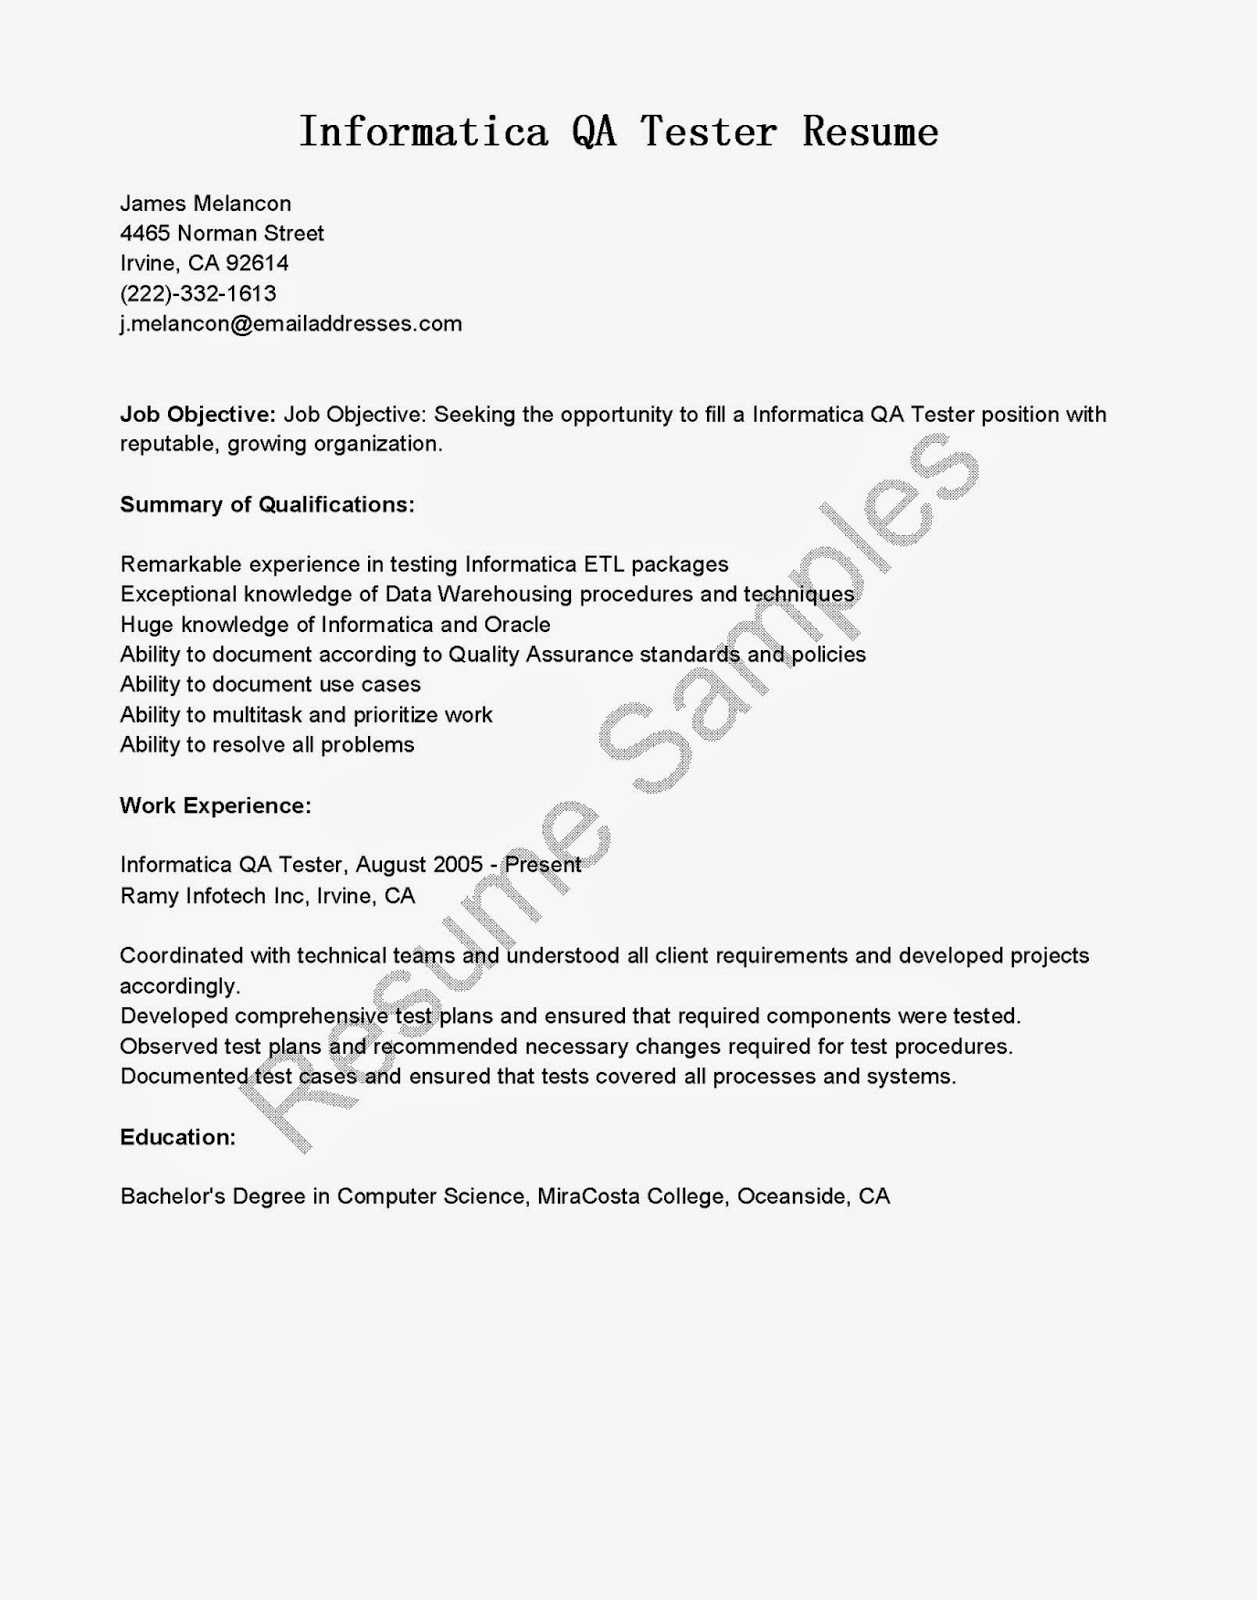 Resume Samples Informatica Qa Tester Resume Sample